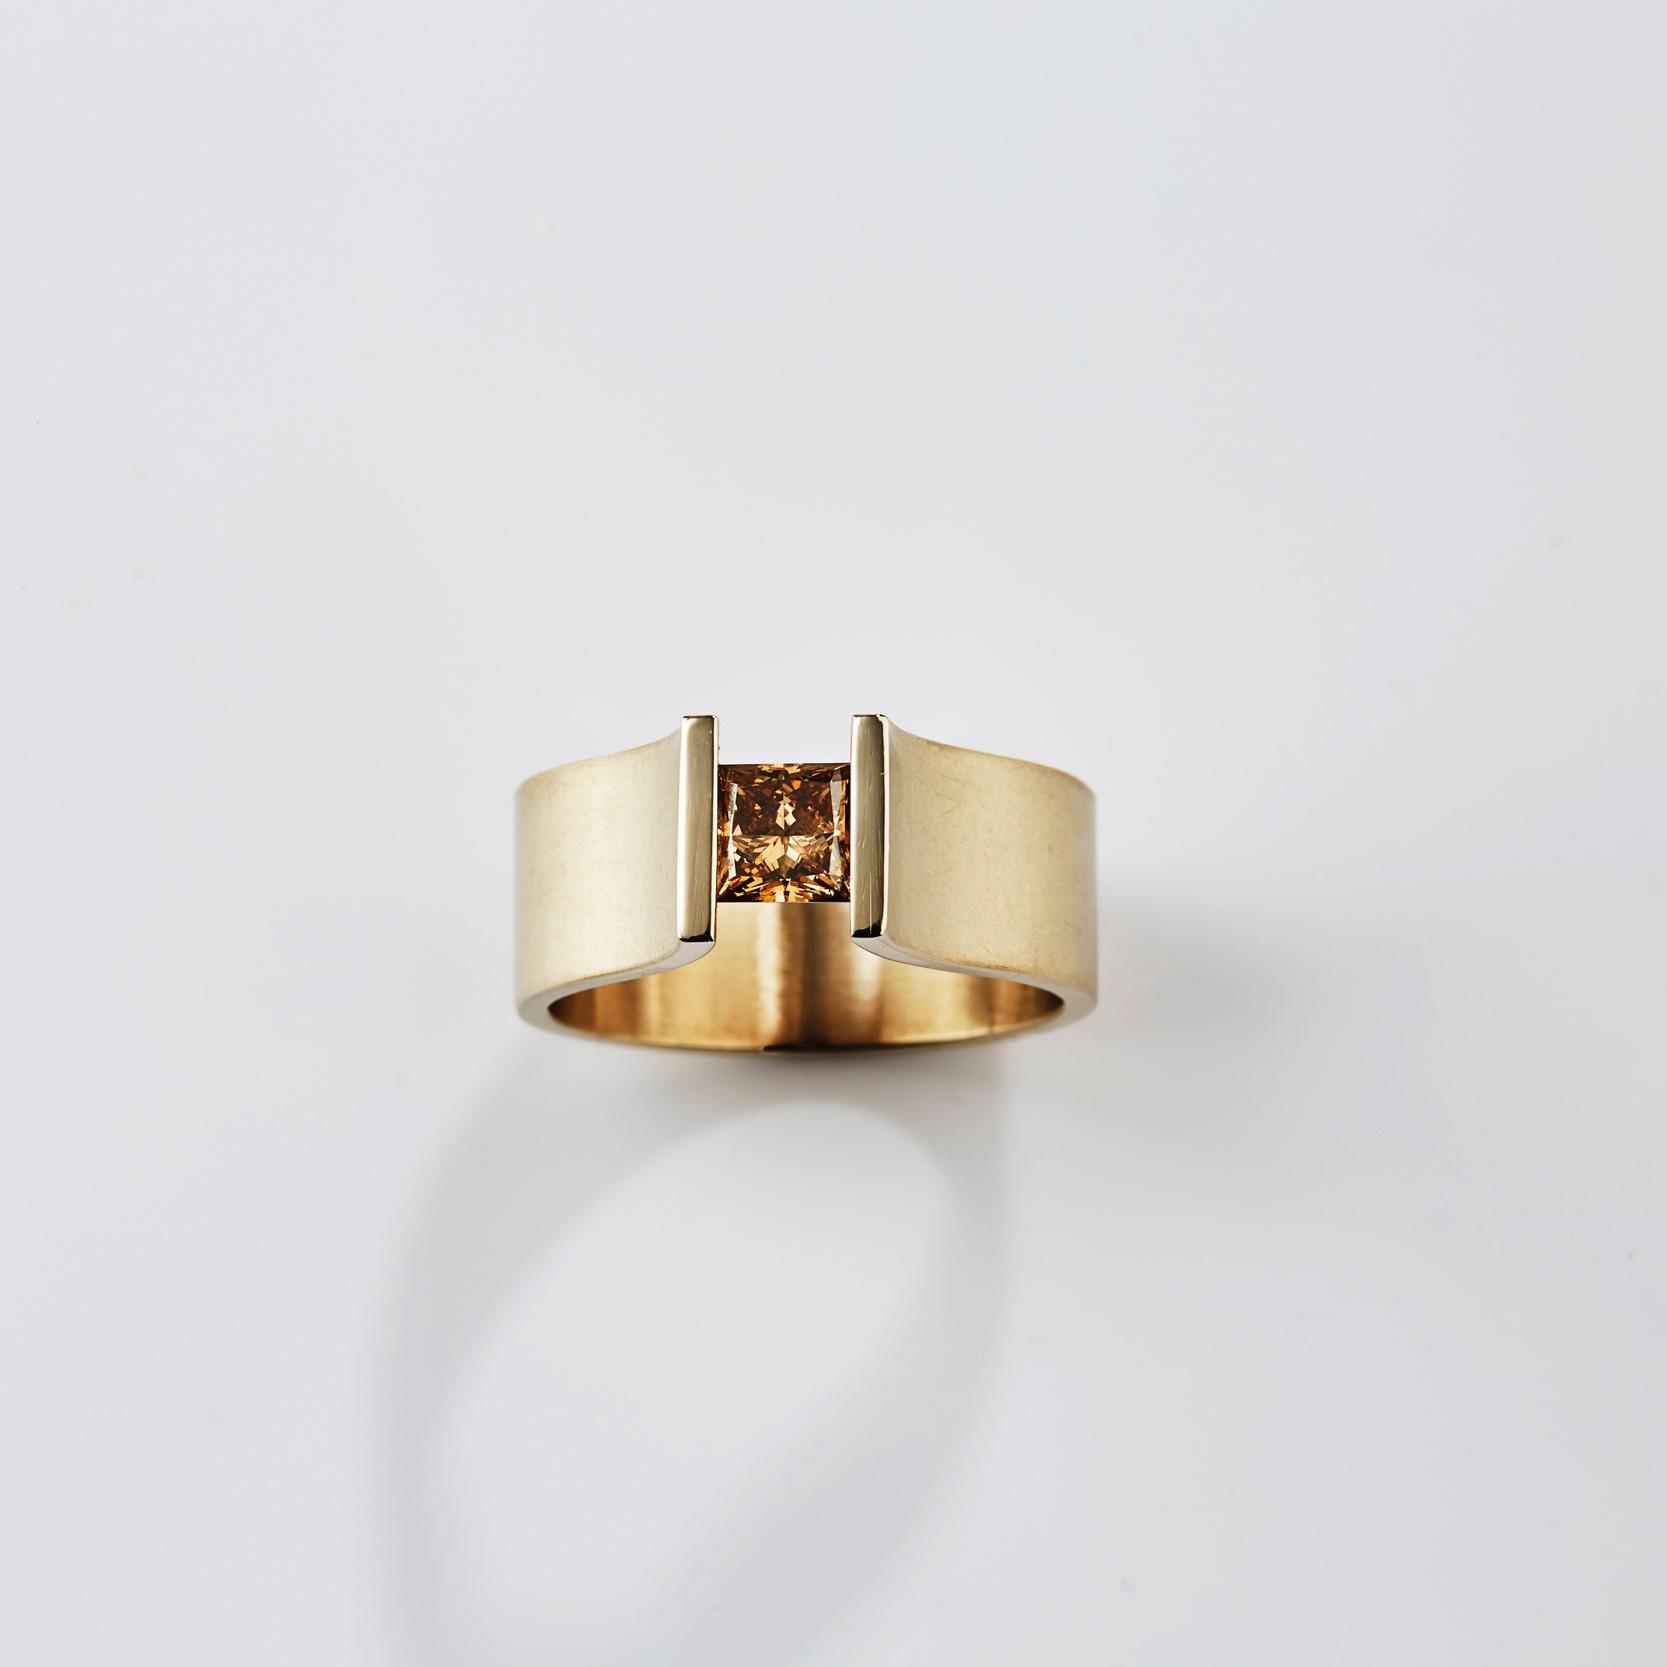 Spanring, natural dark champagne diamond,18k goud Rembrandt Jordan.jpg